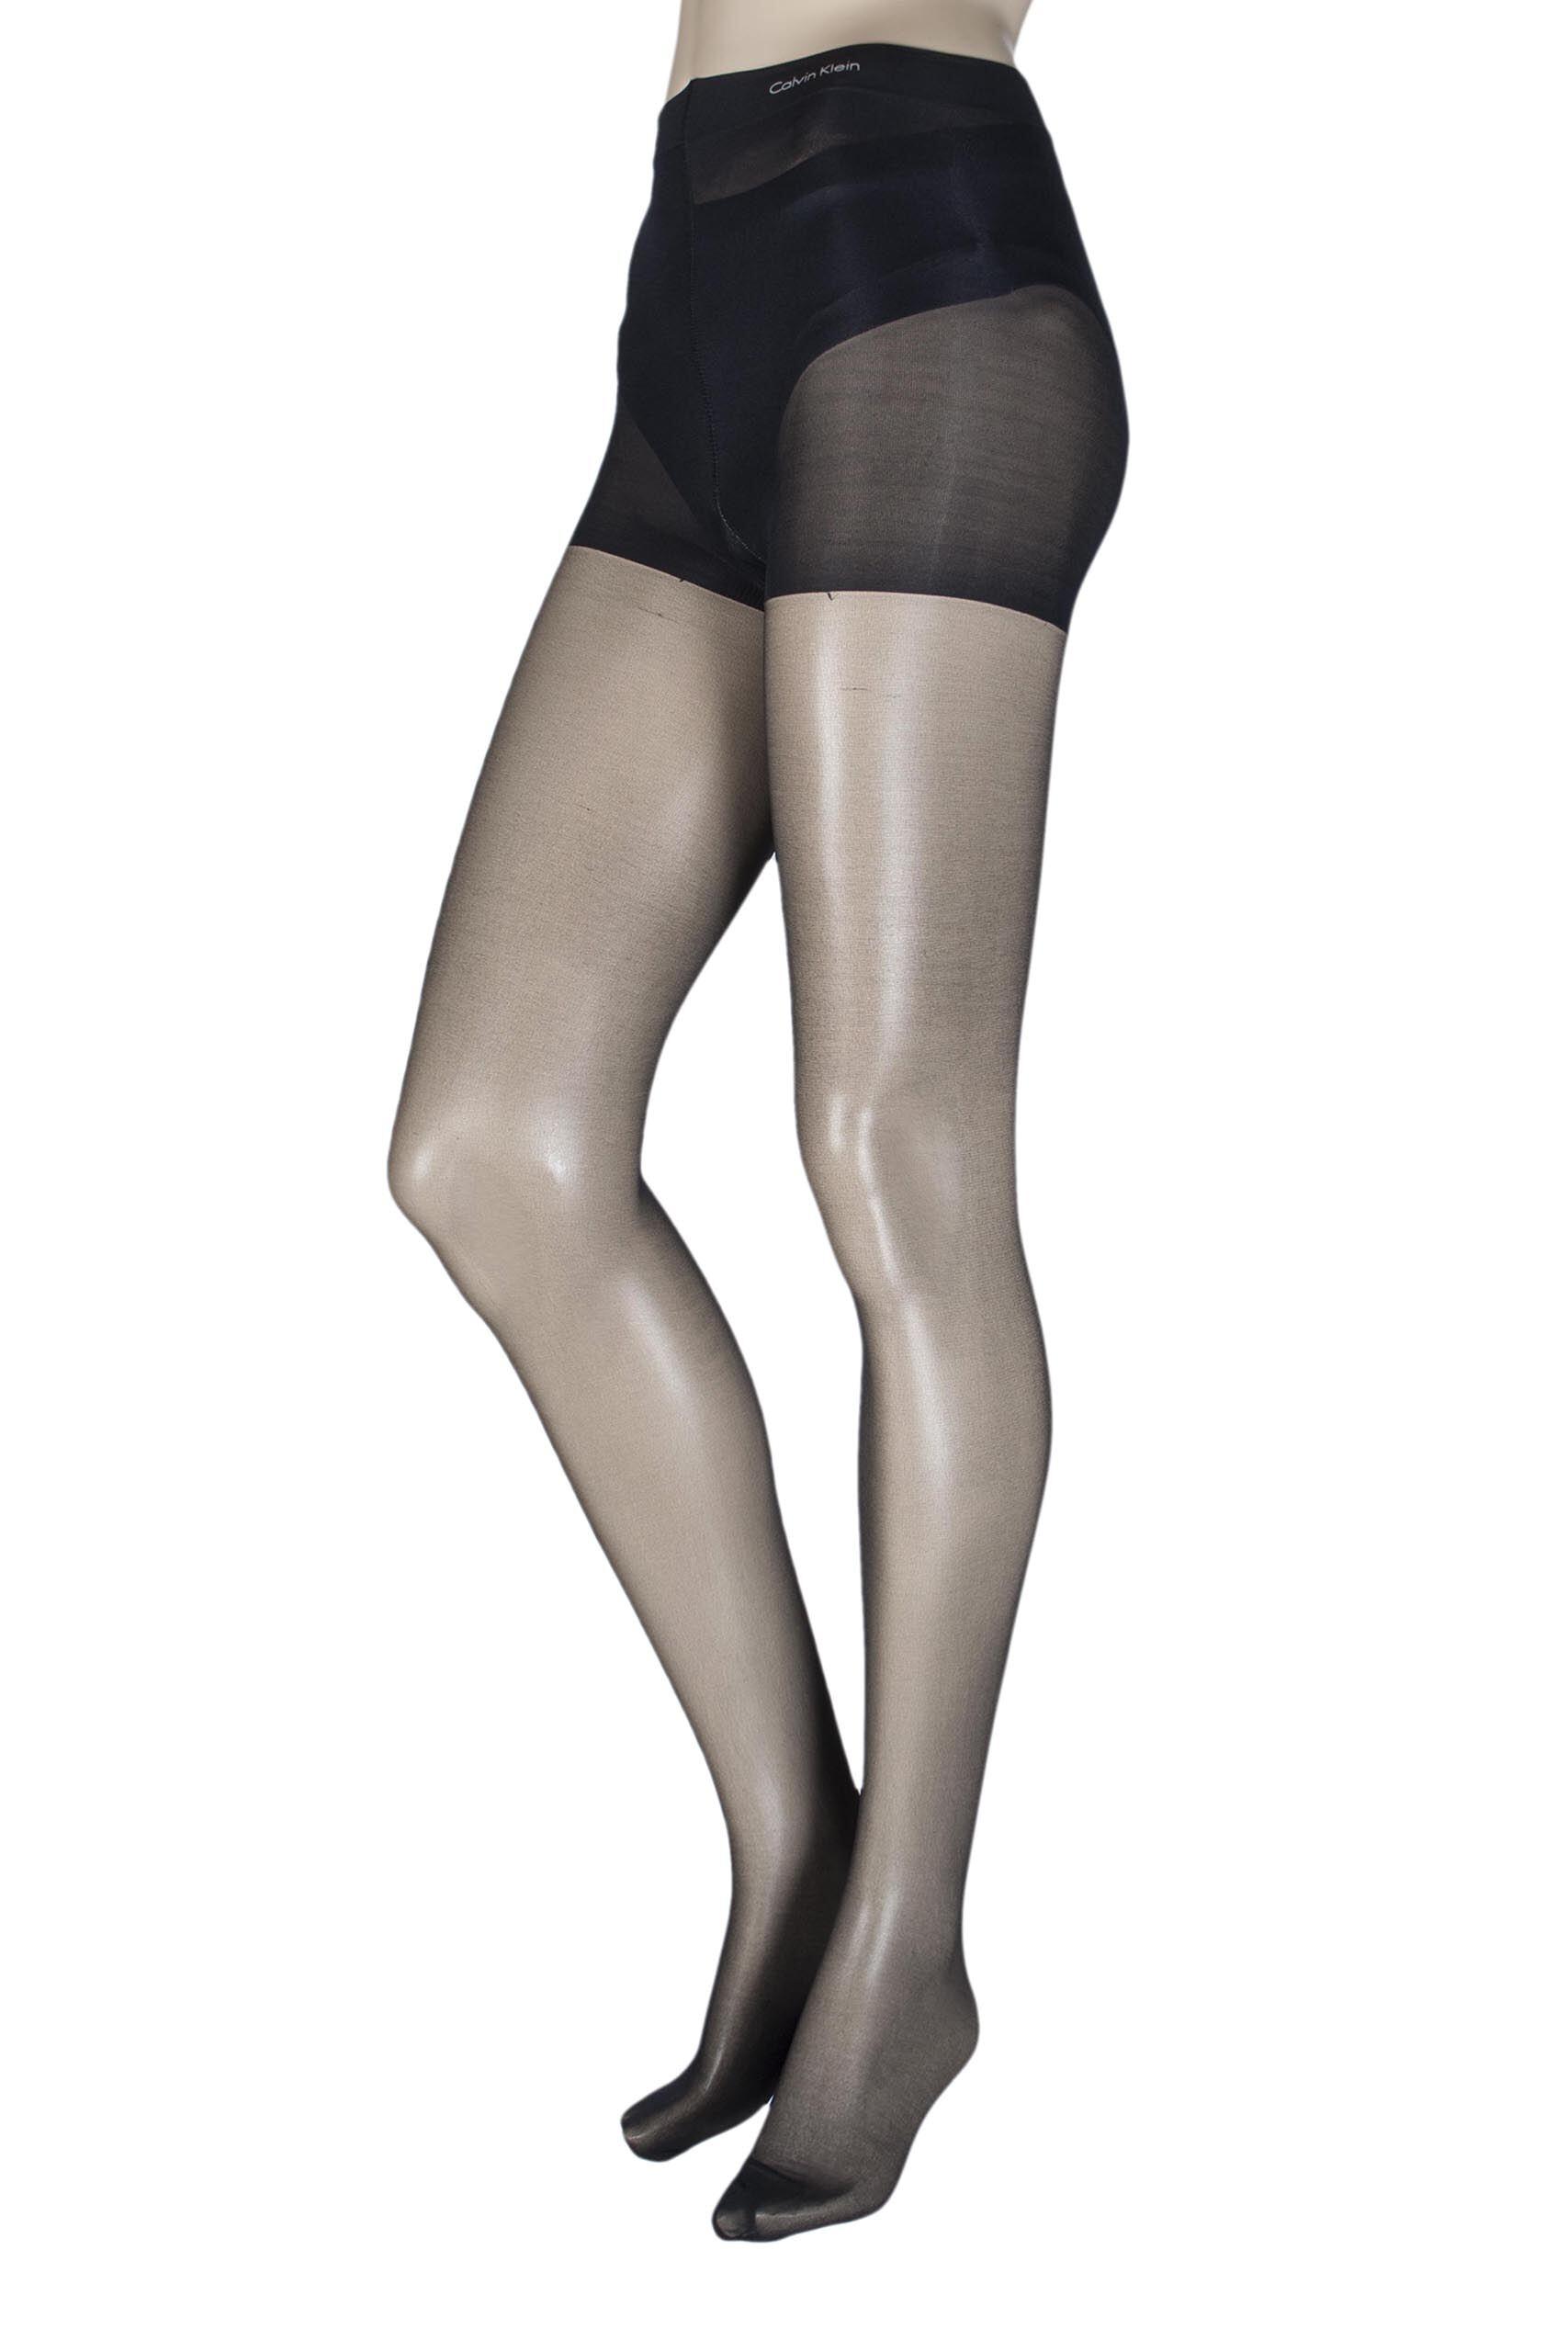 Image of 1 Pair Black Ultra Bare Infinate Sheer Tights with Control Top Ladies Medium - Calvin Klein